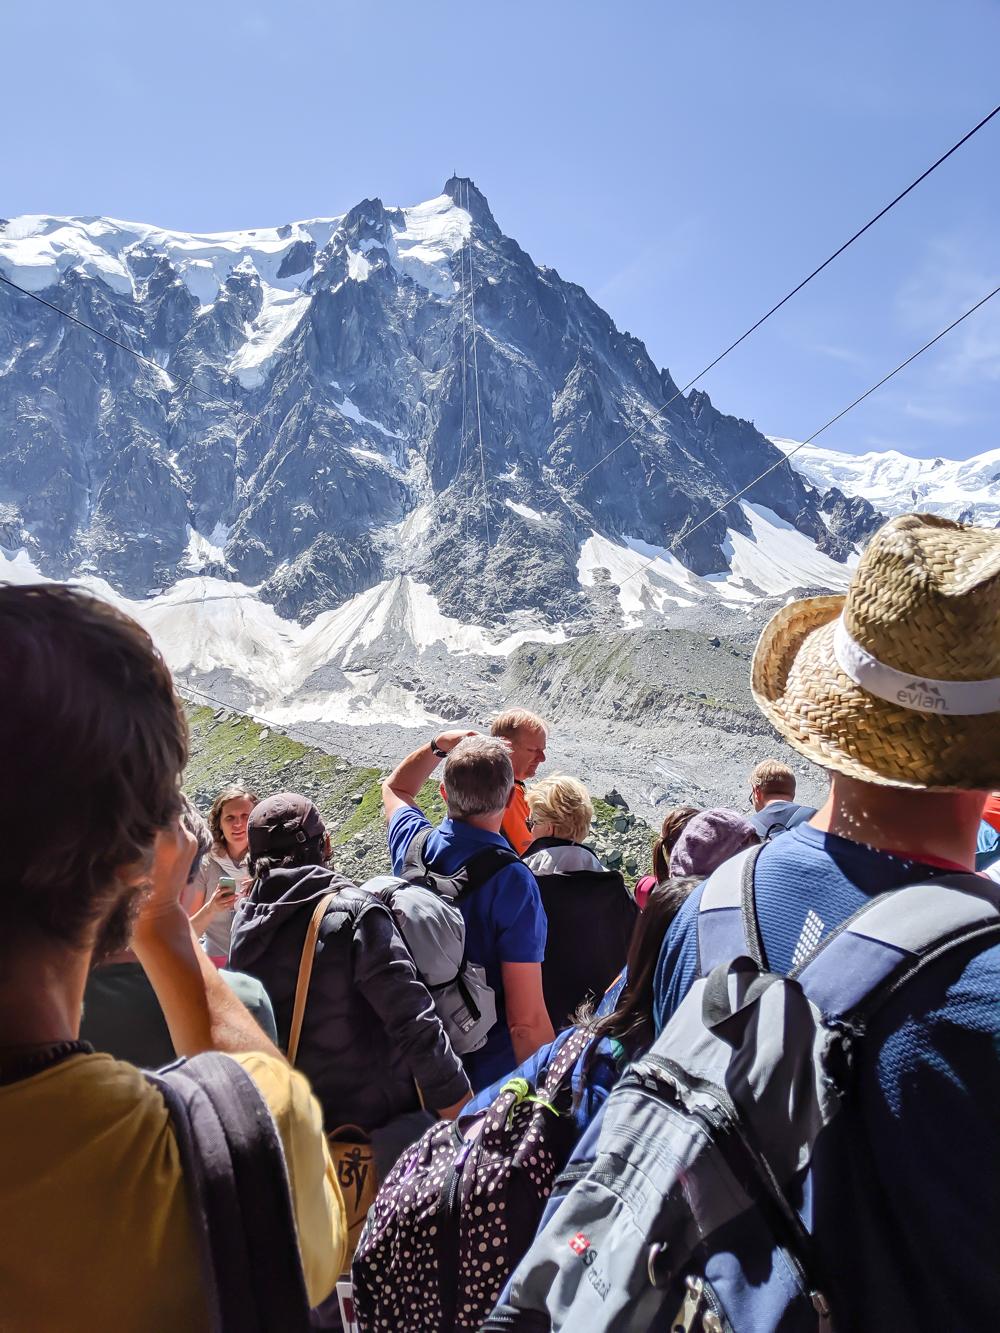 Aiguille du Midi summer visitor's guide, Chamonix, France: waiting for the cable car at Plan de l'Aiguille